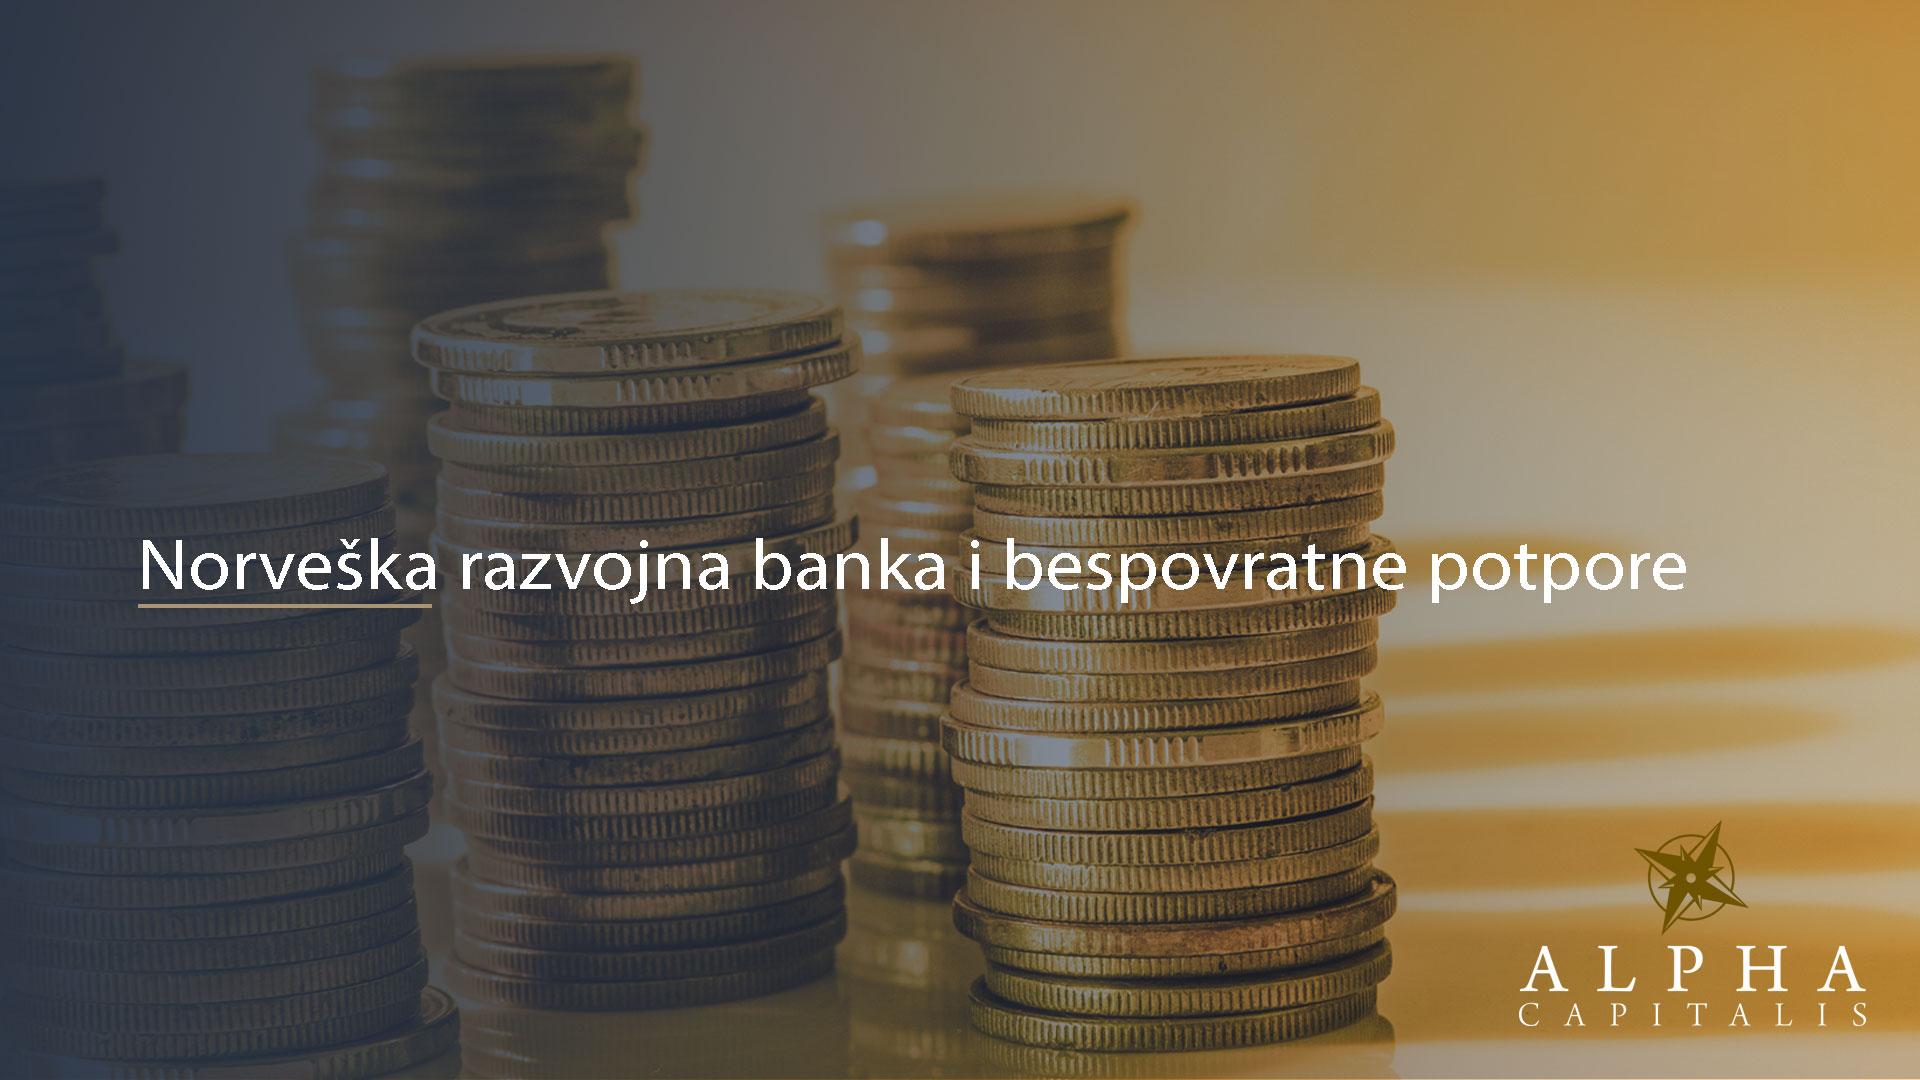 alpha-capitalis-novosti-norveska-razvojna-banka-bespovratne-potpore